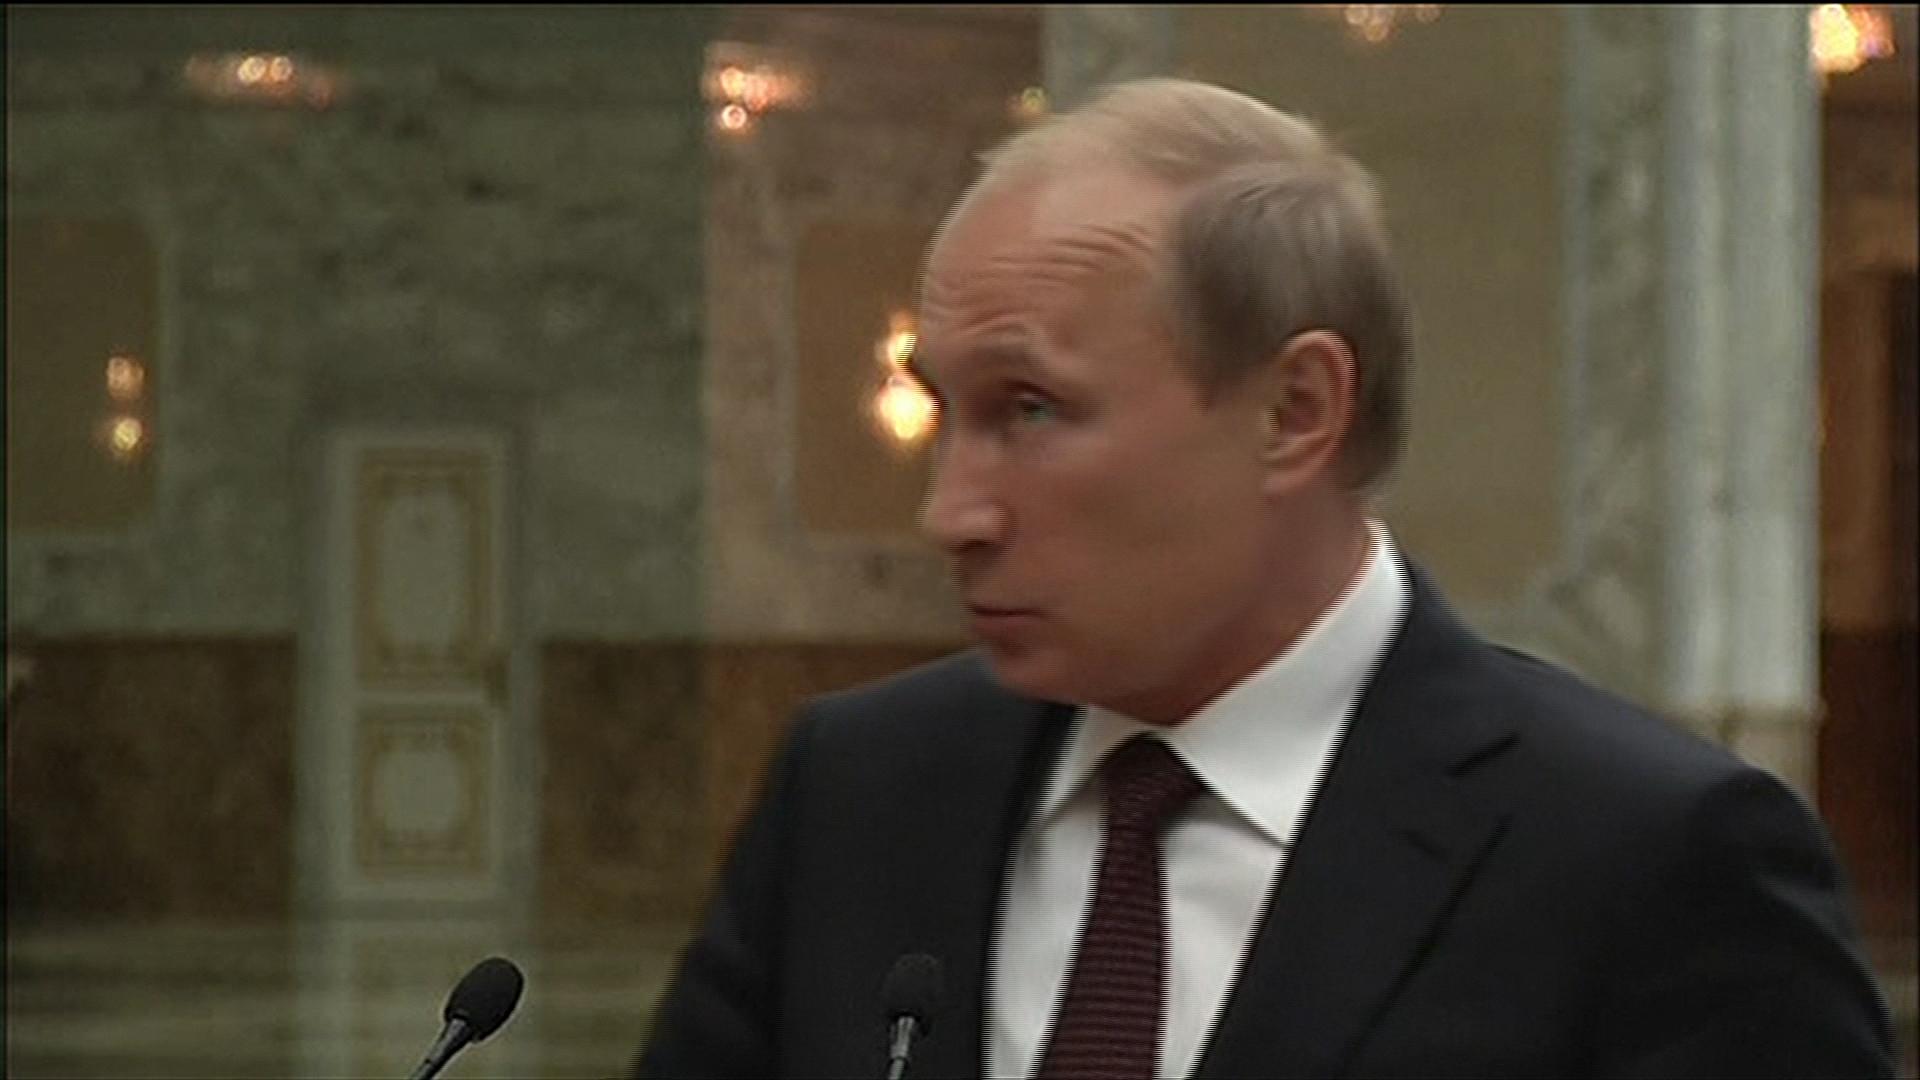 Obama contends with ISIS, Ukraine crises